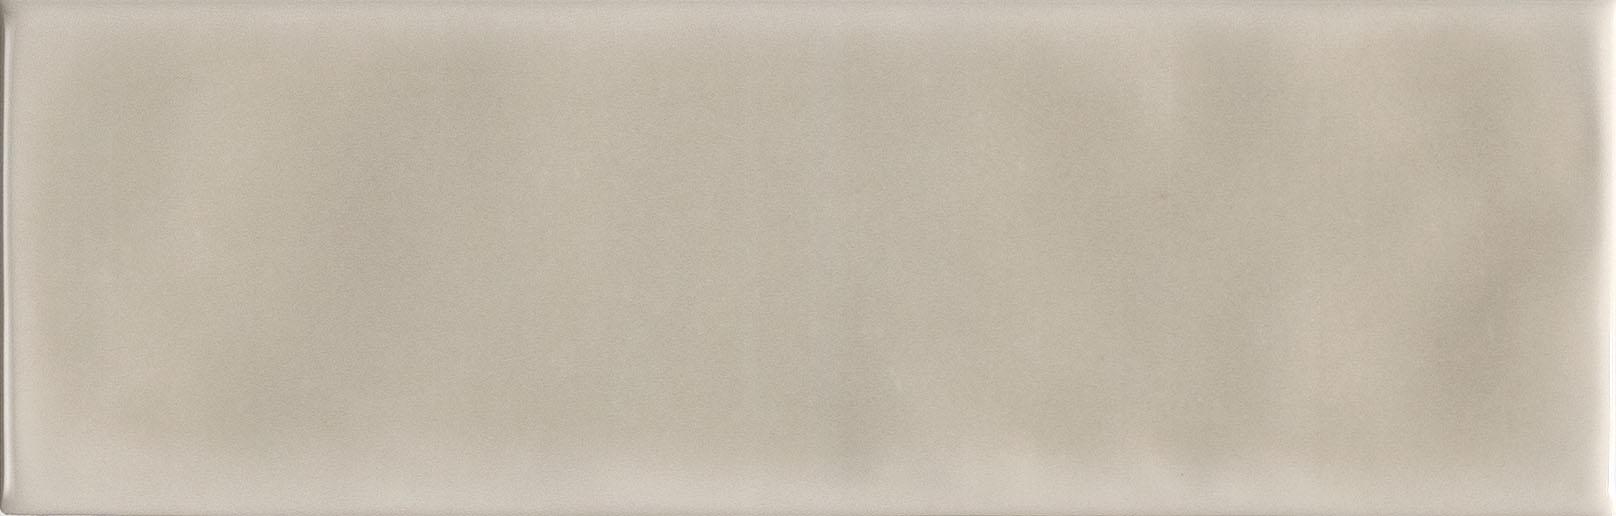 0190935, Brick Inspiration, Beige, seina